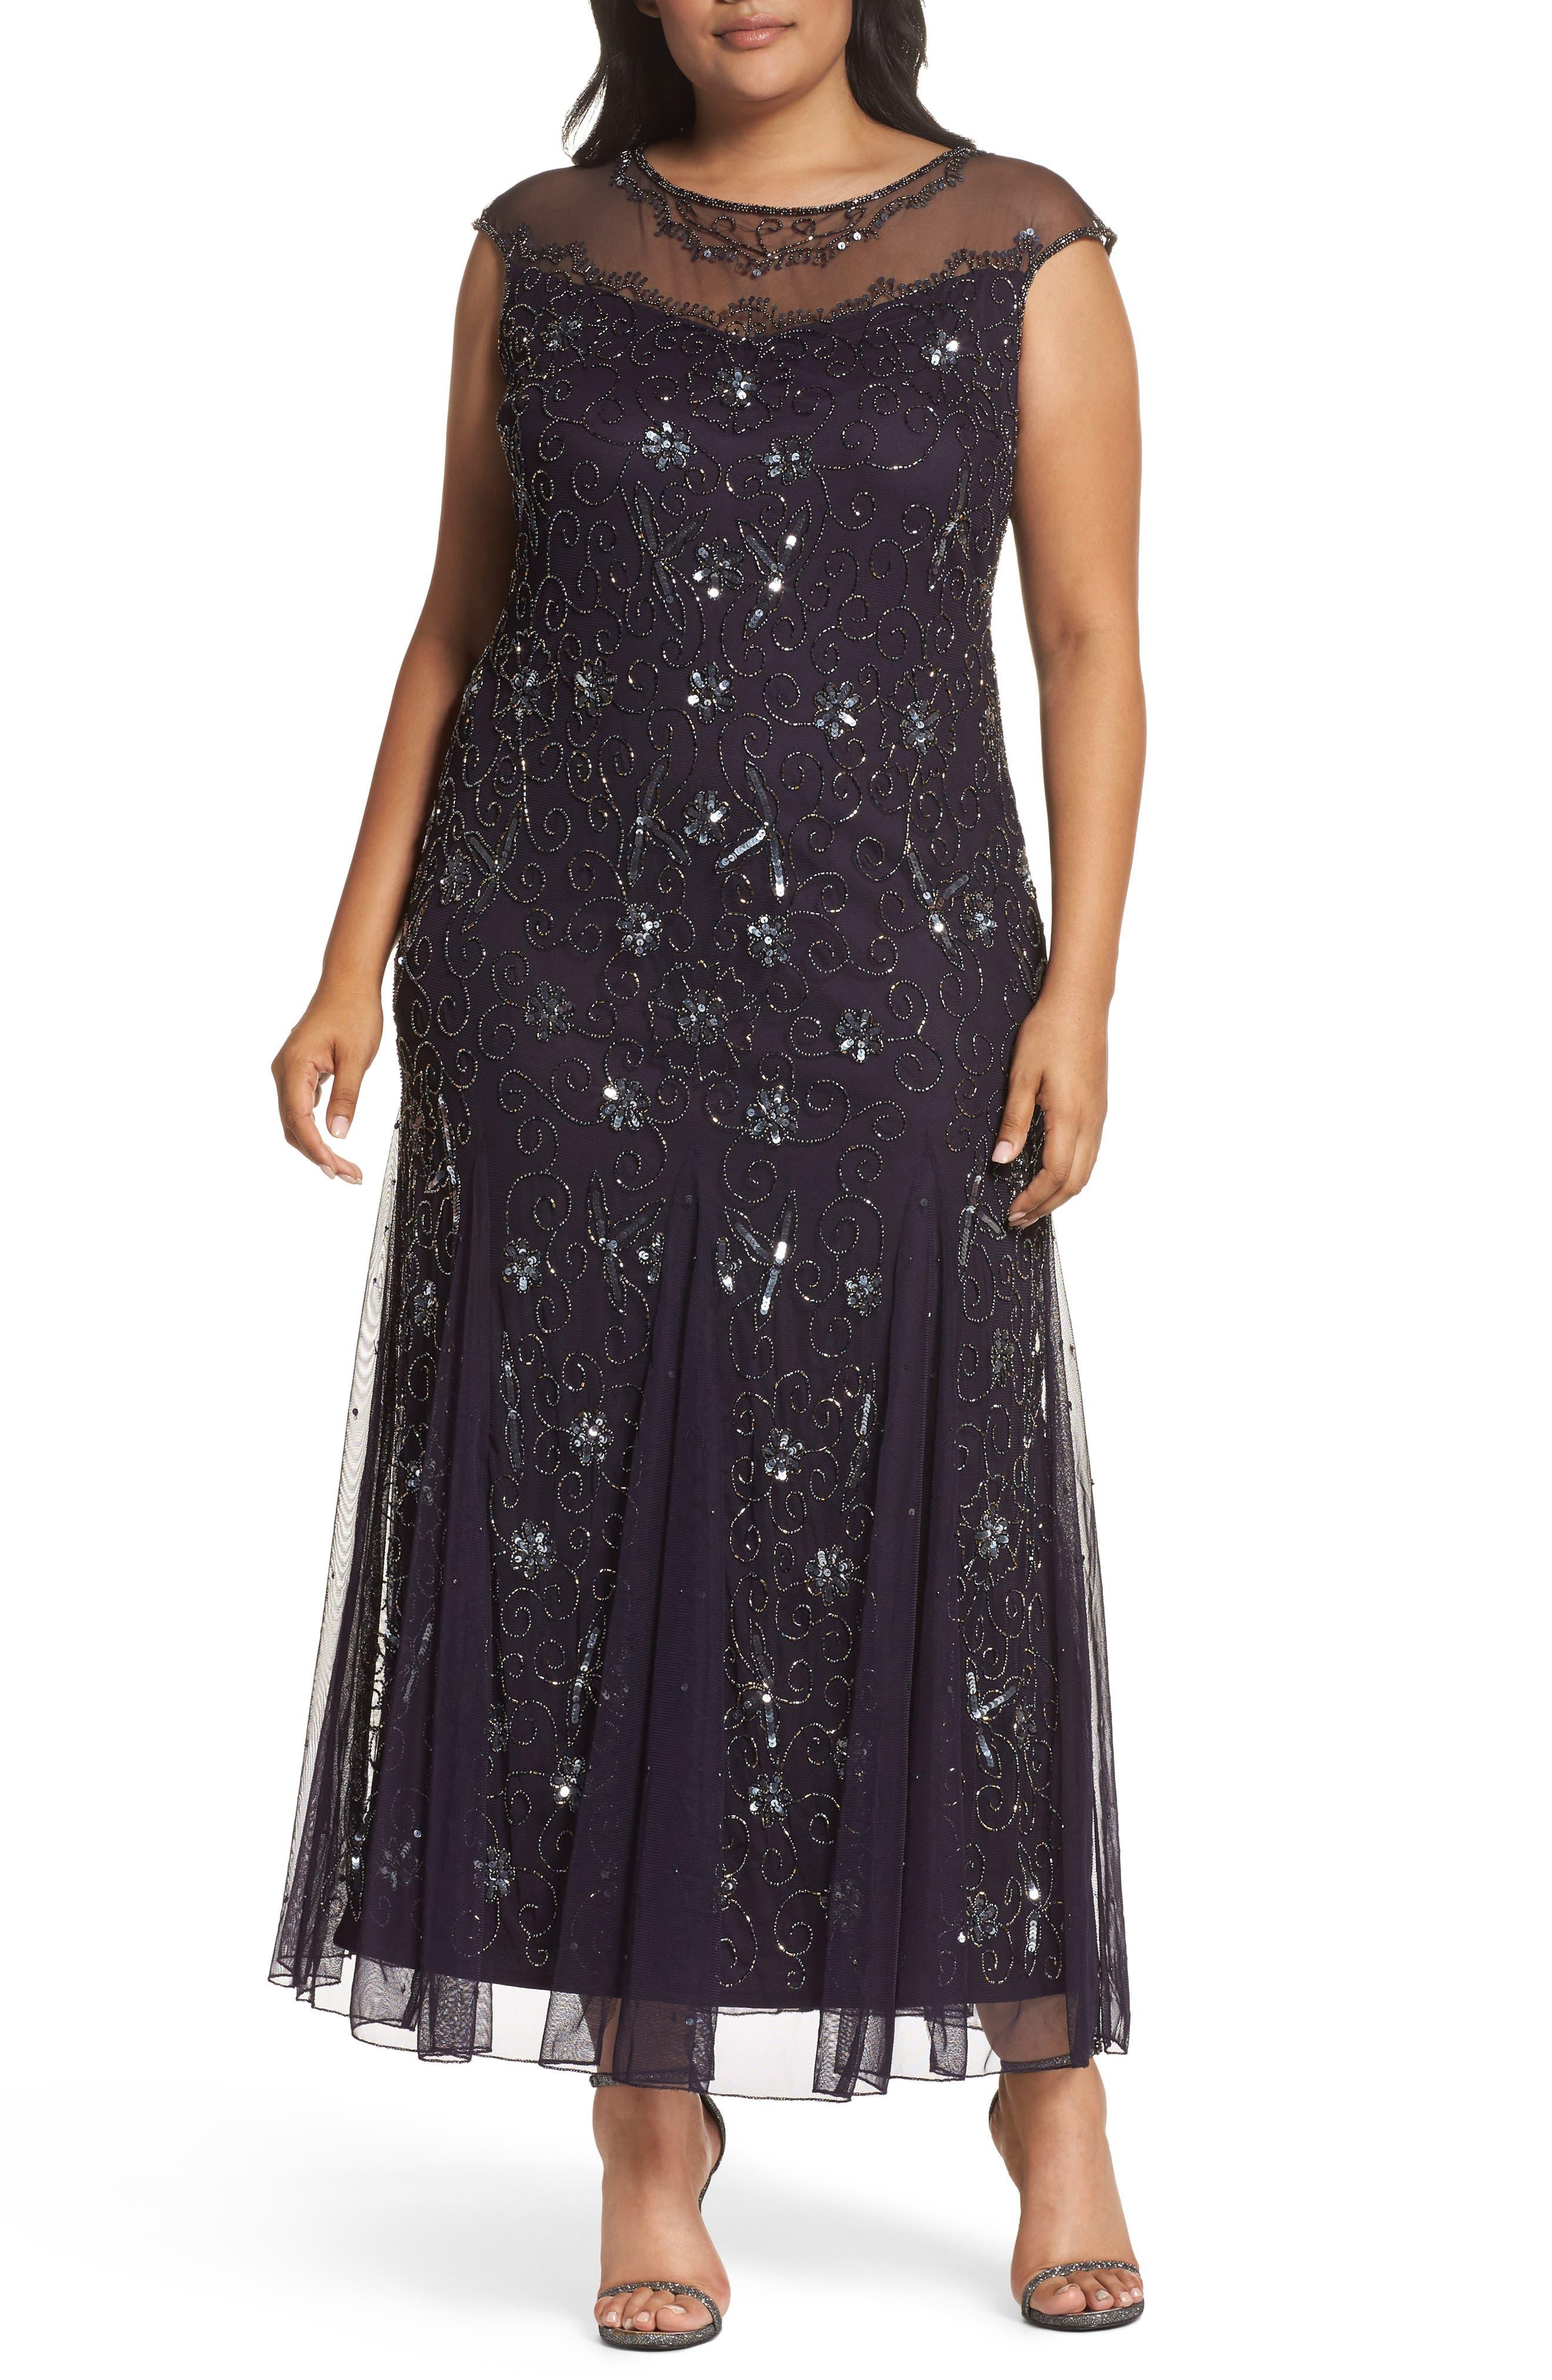 Main Image - Pisarro Nights Embellished Mesh Godet Gown (Plus Size)